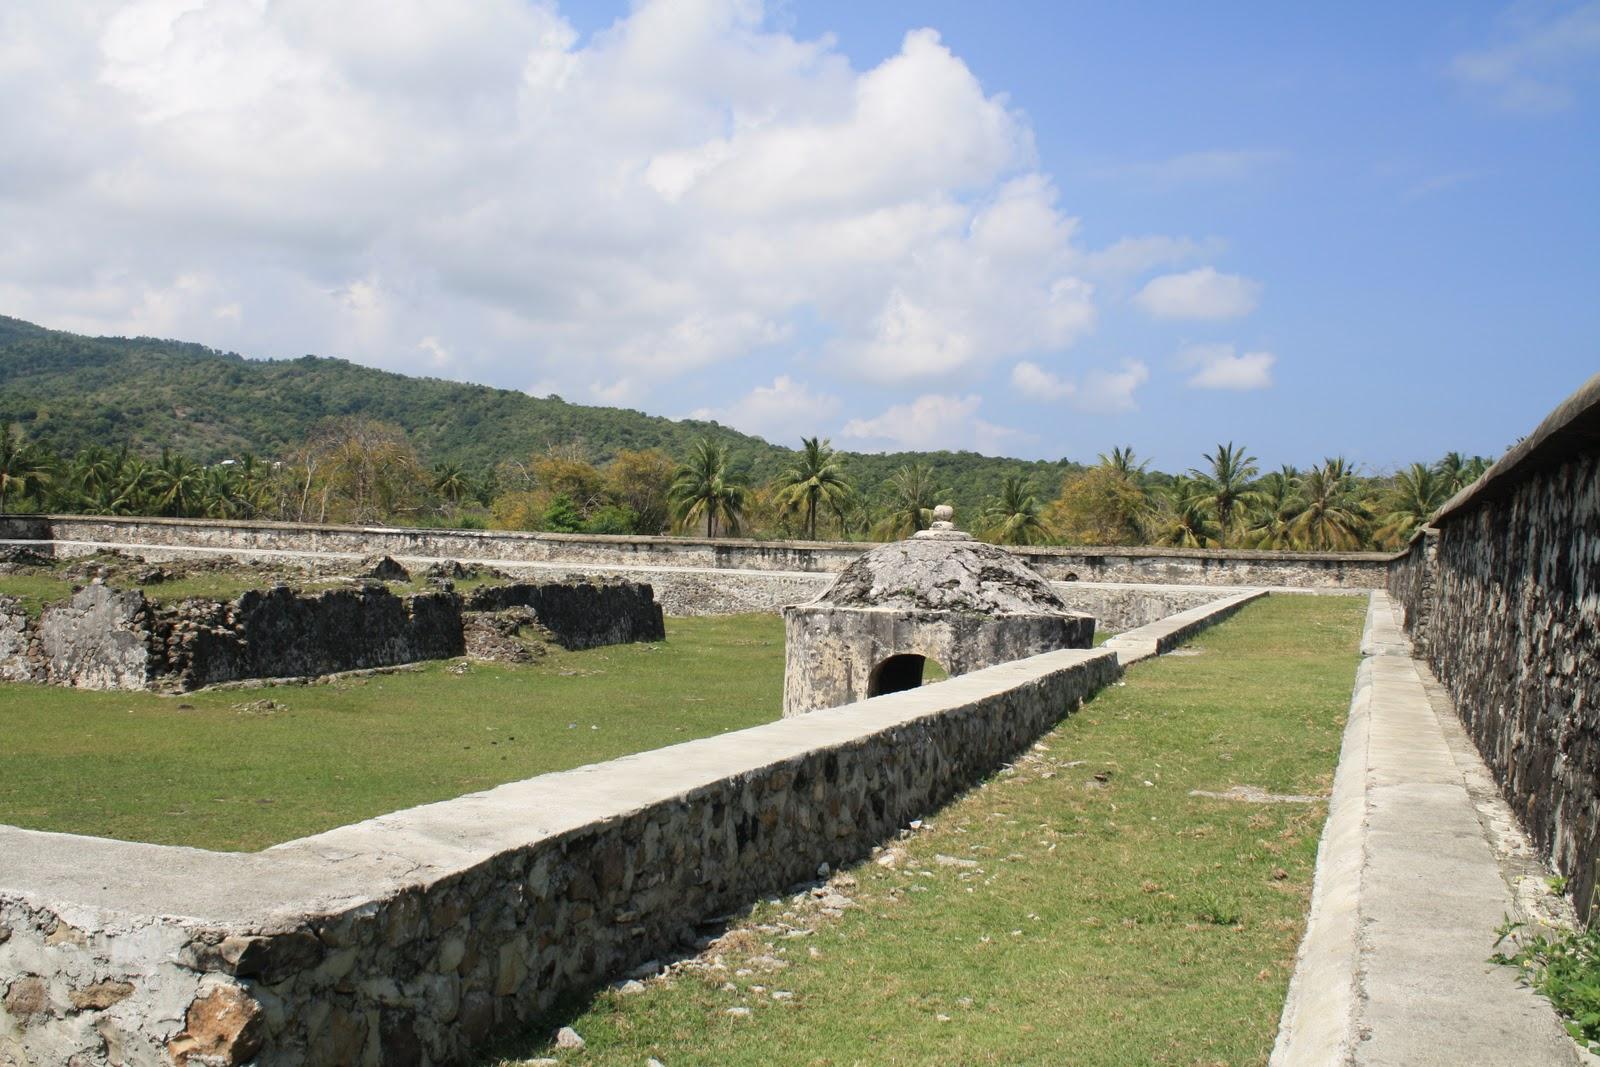 Benteng Budaya Kesultanan Aceh Net Indrapatra Kota Banda